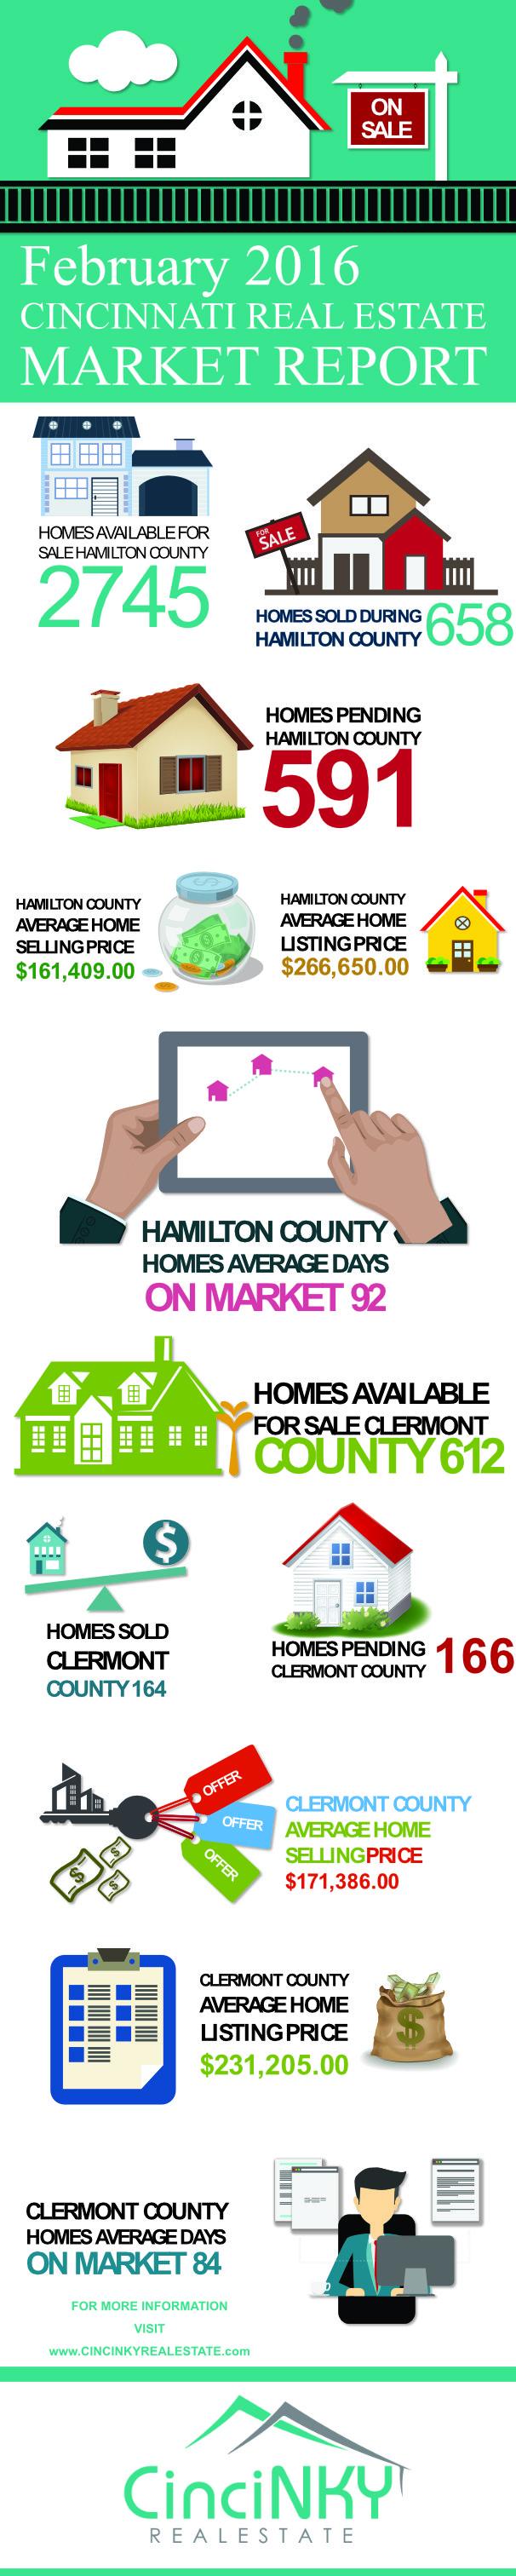 Infographic of Cincinnati February 2016 Real Estate Market Statistics